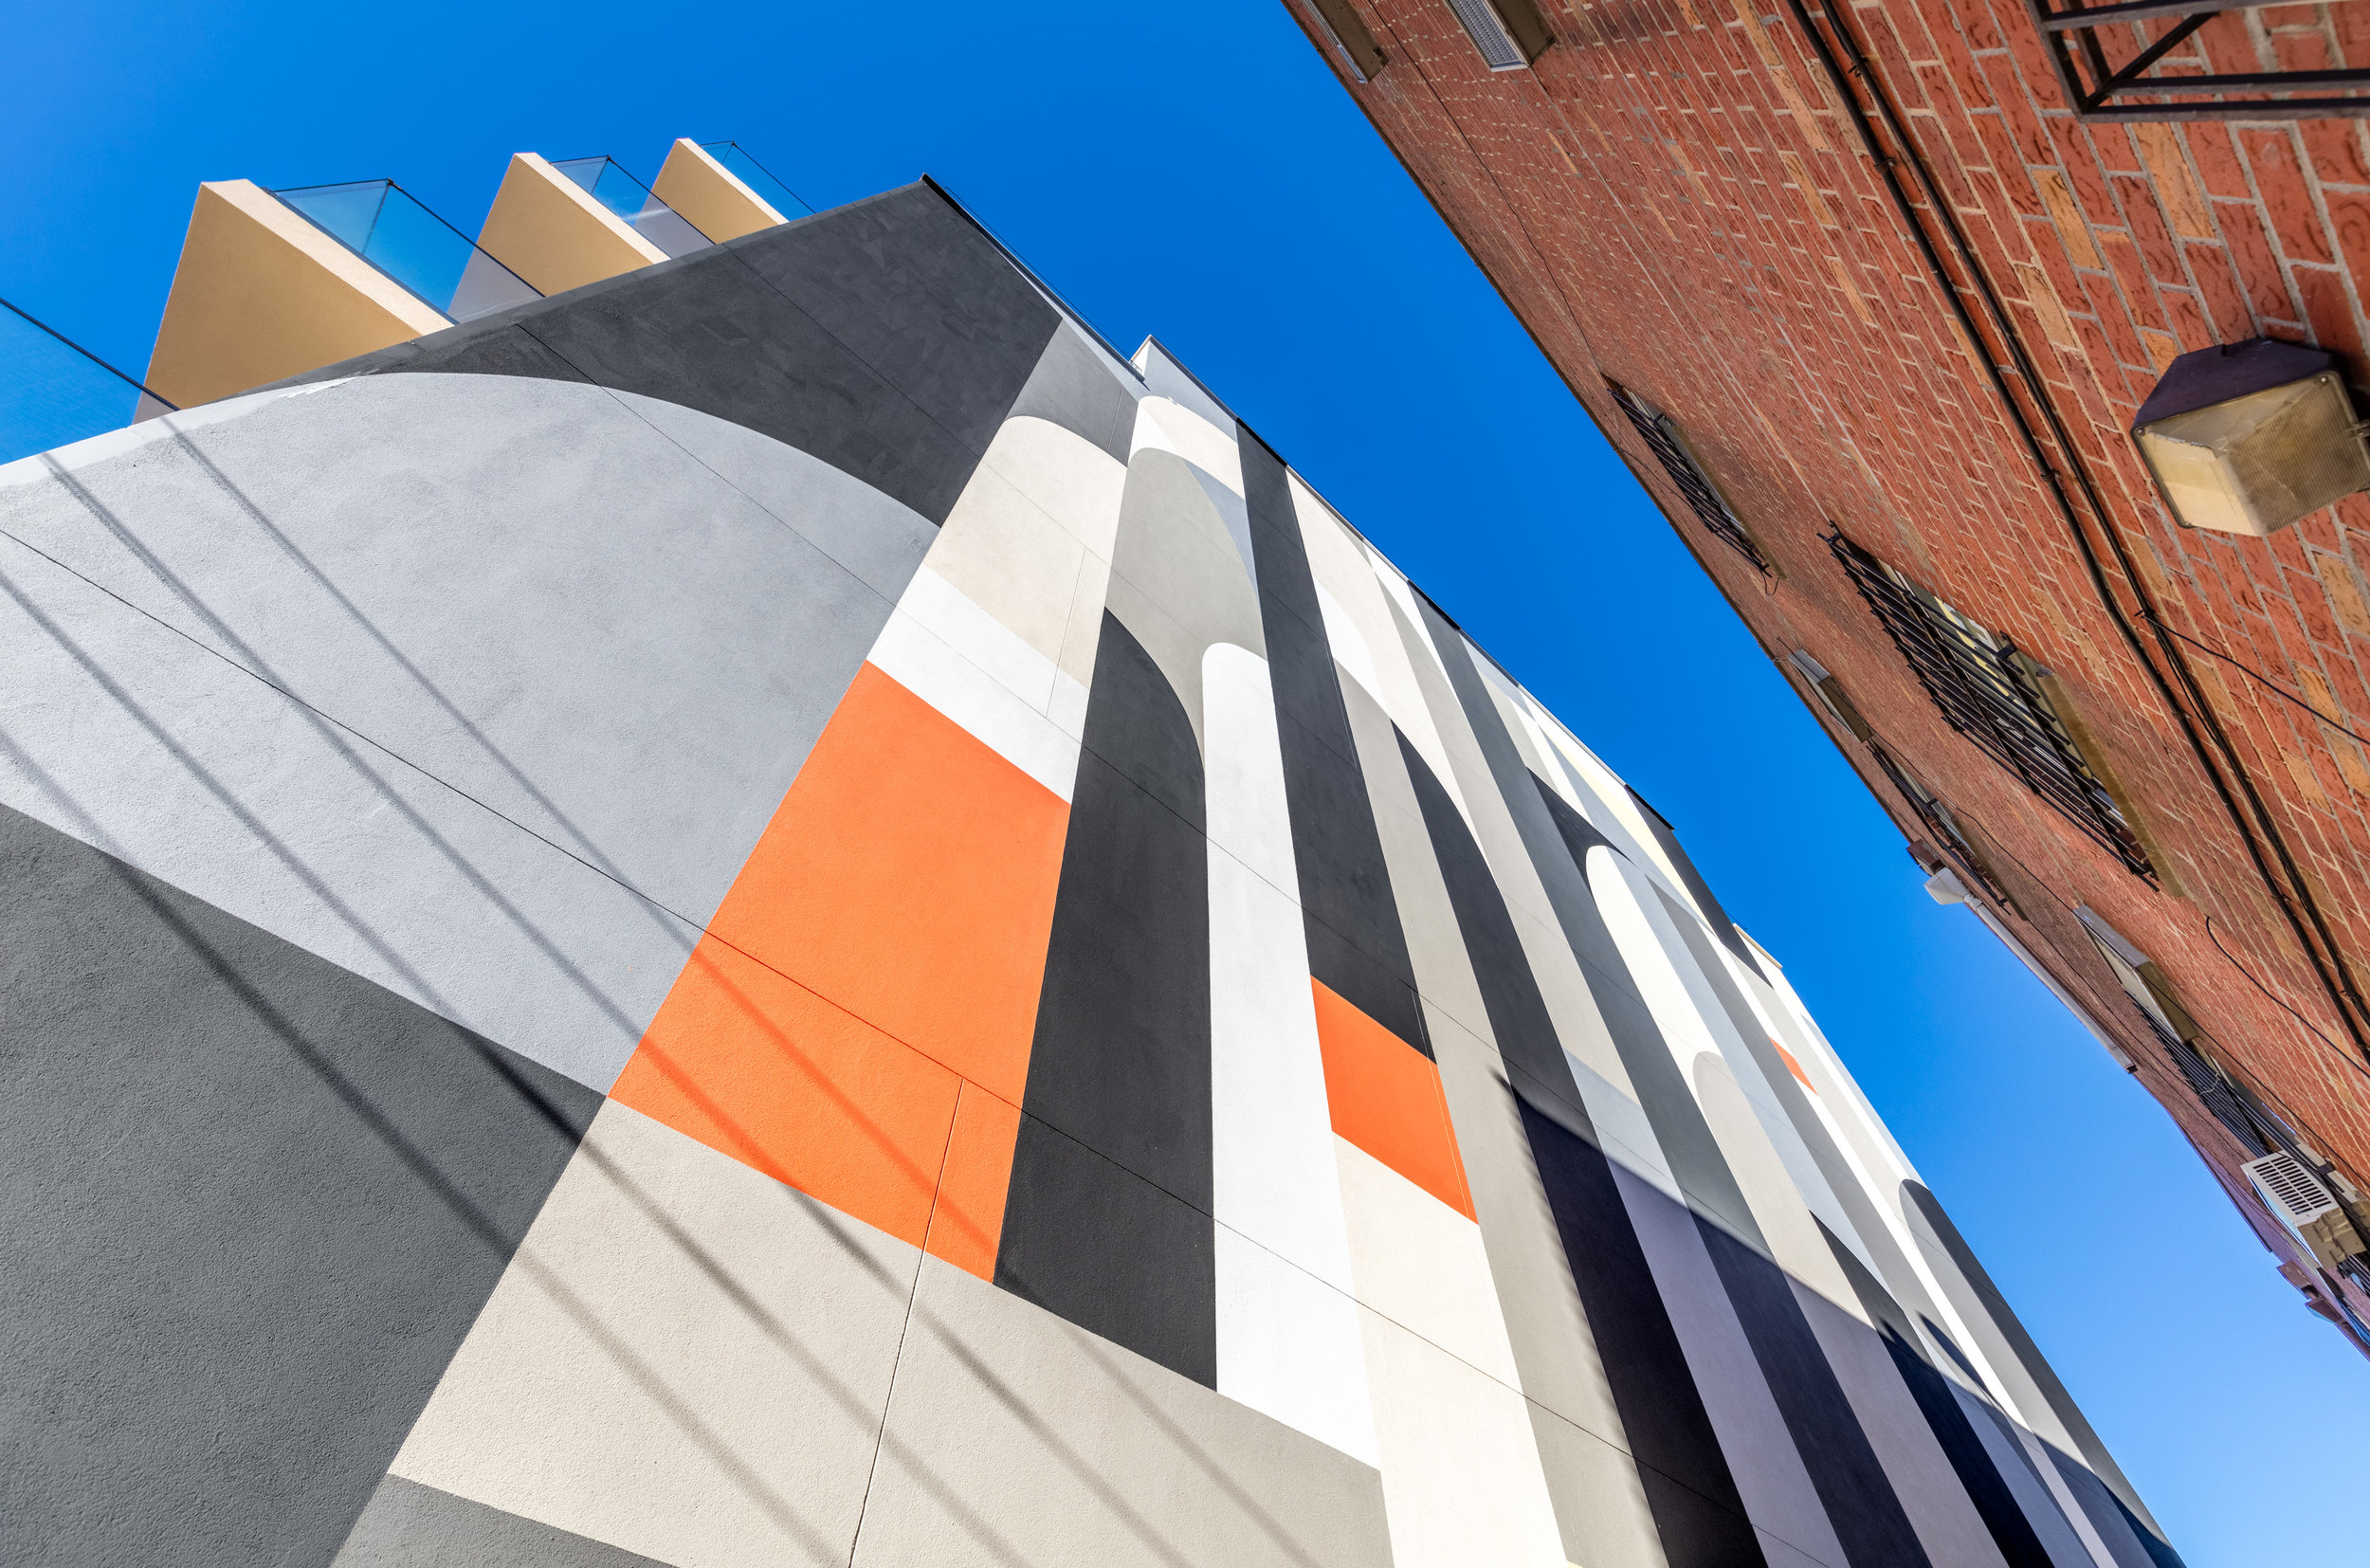 Graffiti House 16 - photo by Max Touhey.jpg